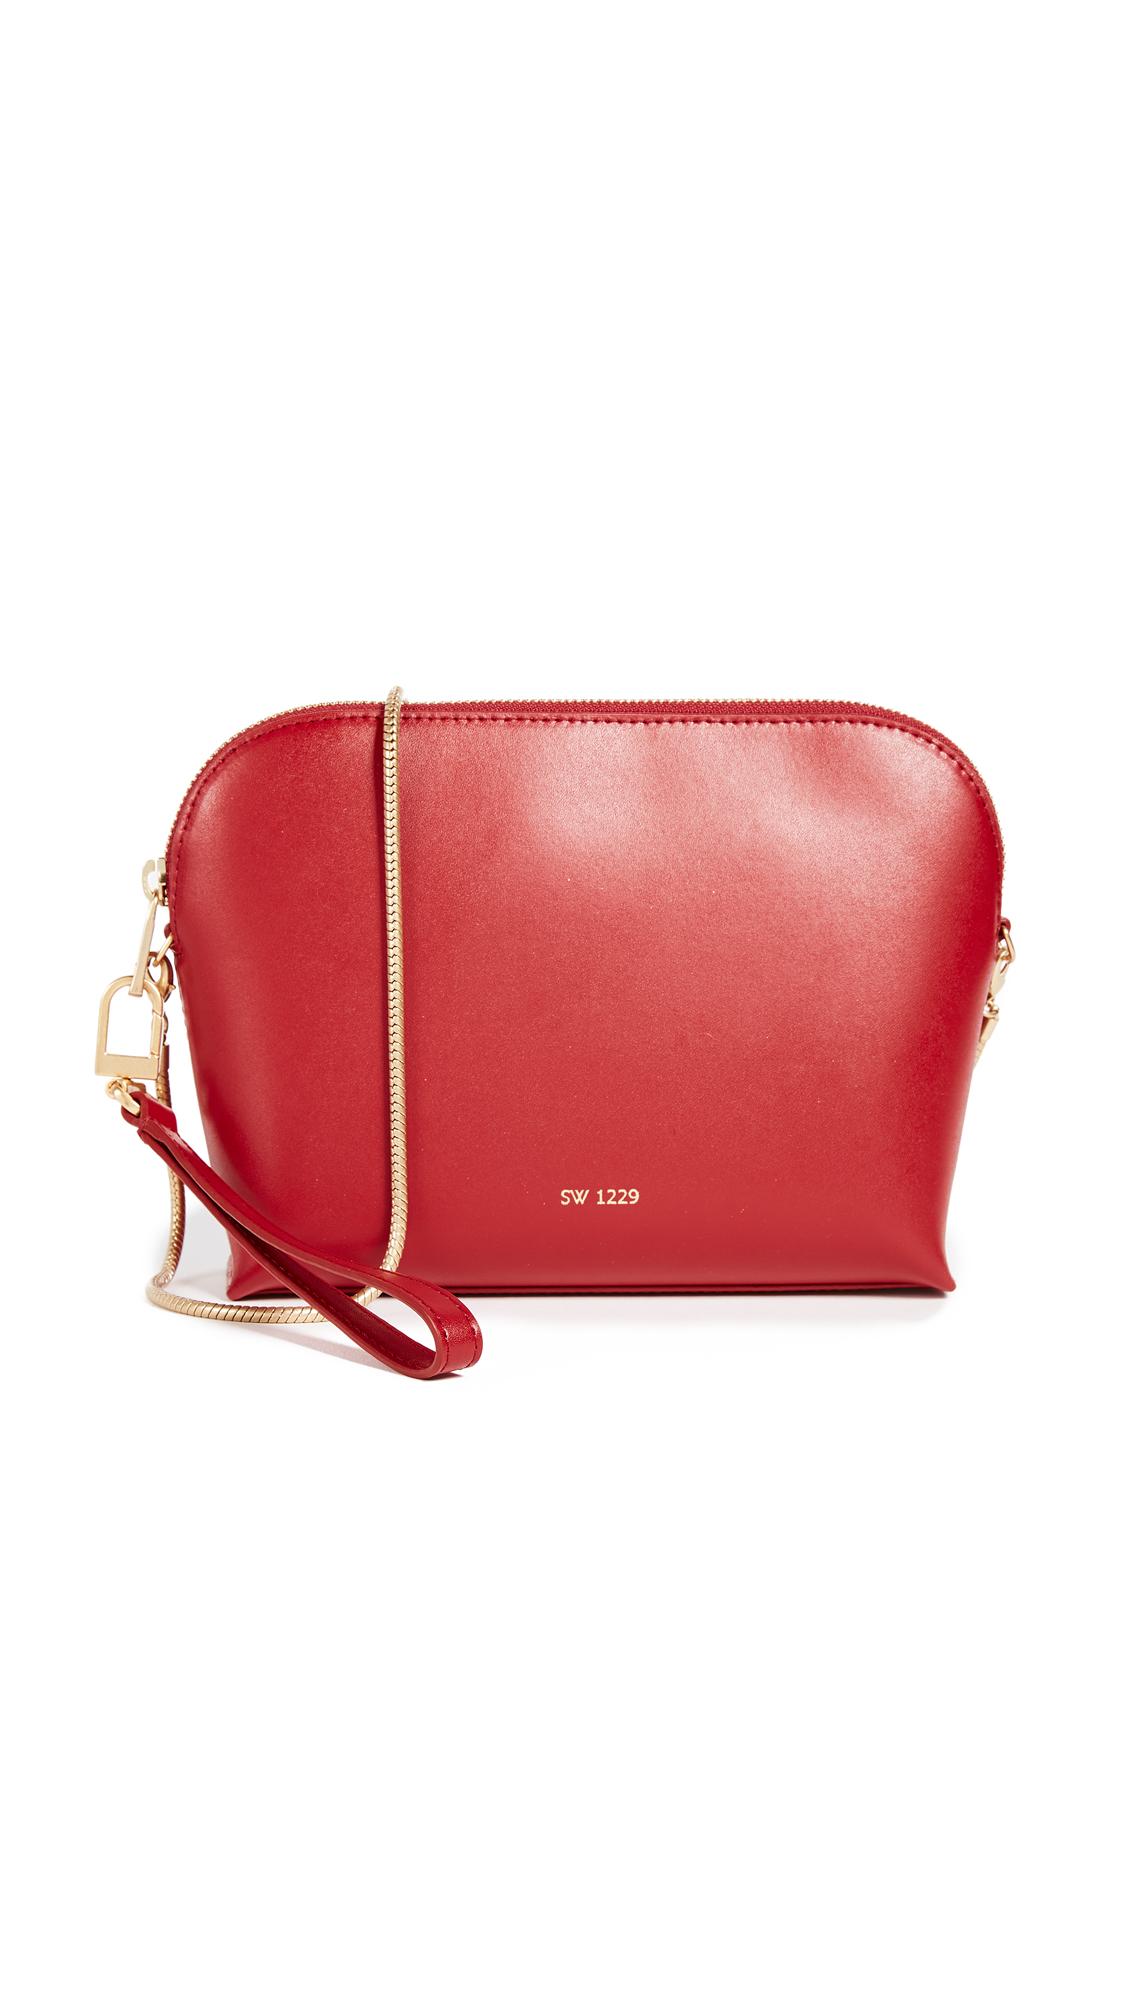 Sarah White Convertible Top Zip Shoulder Bag - Red